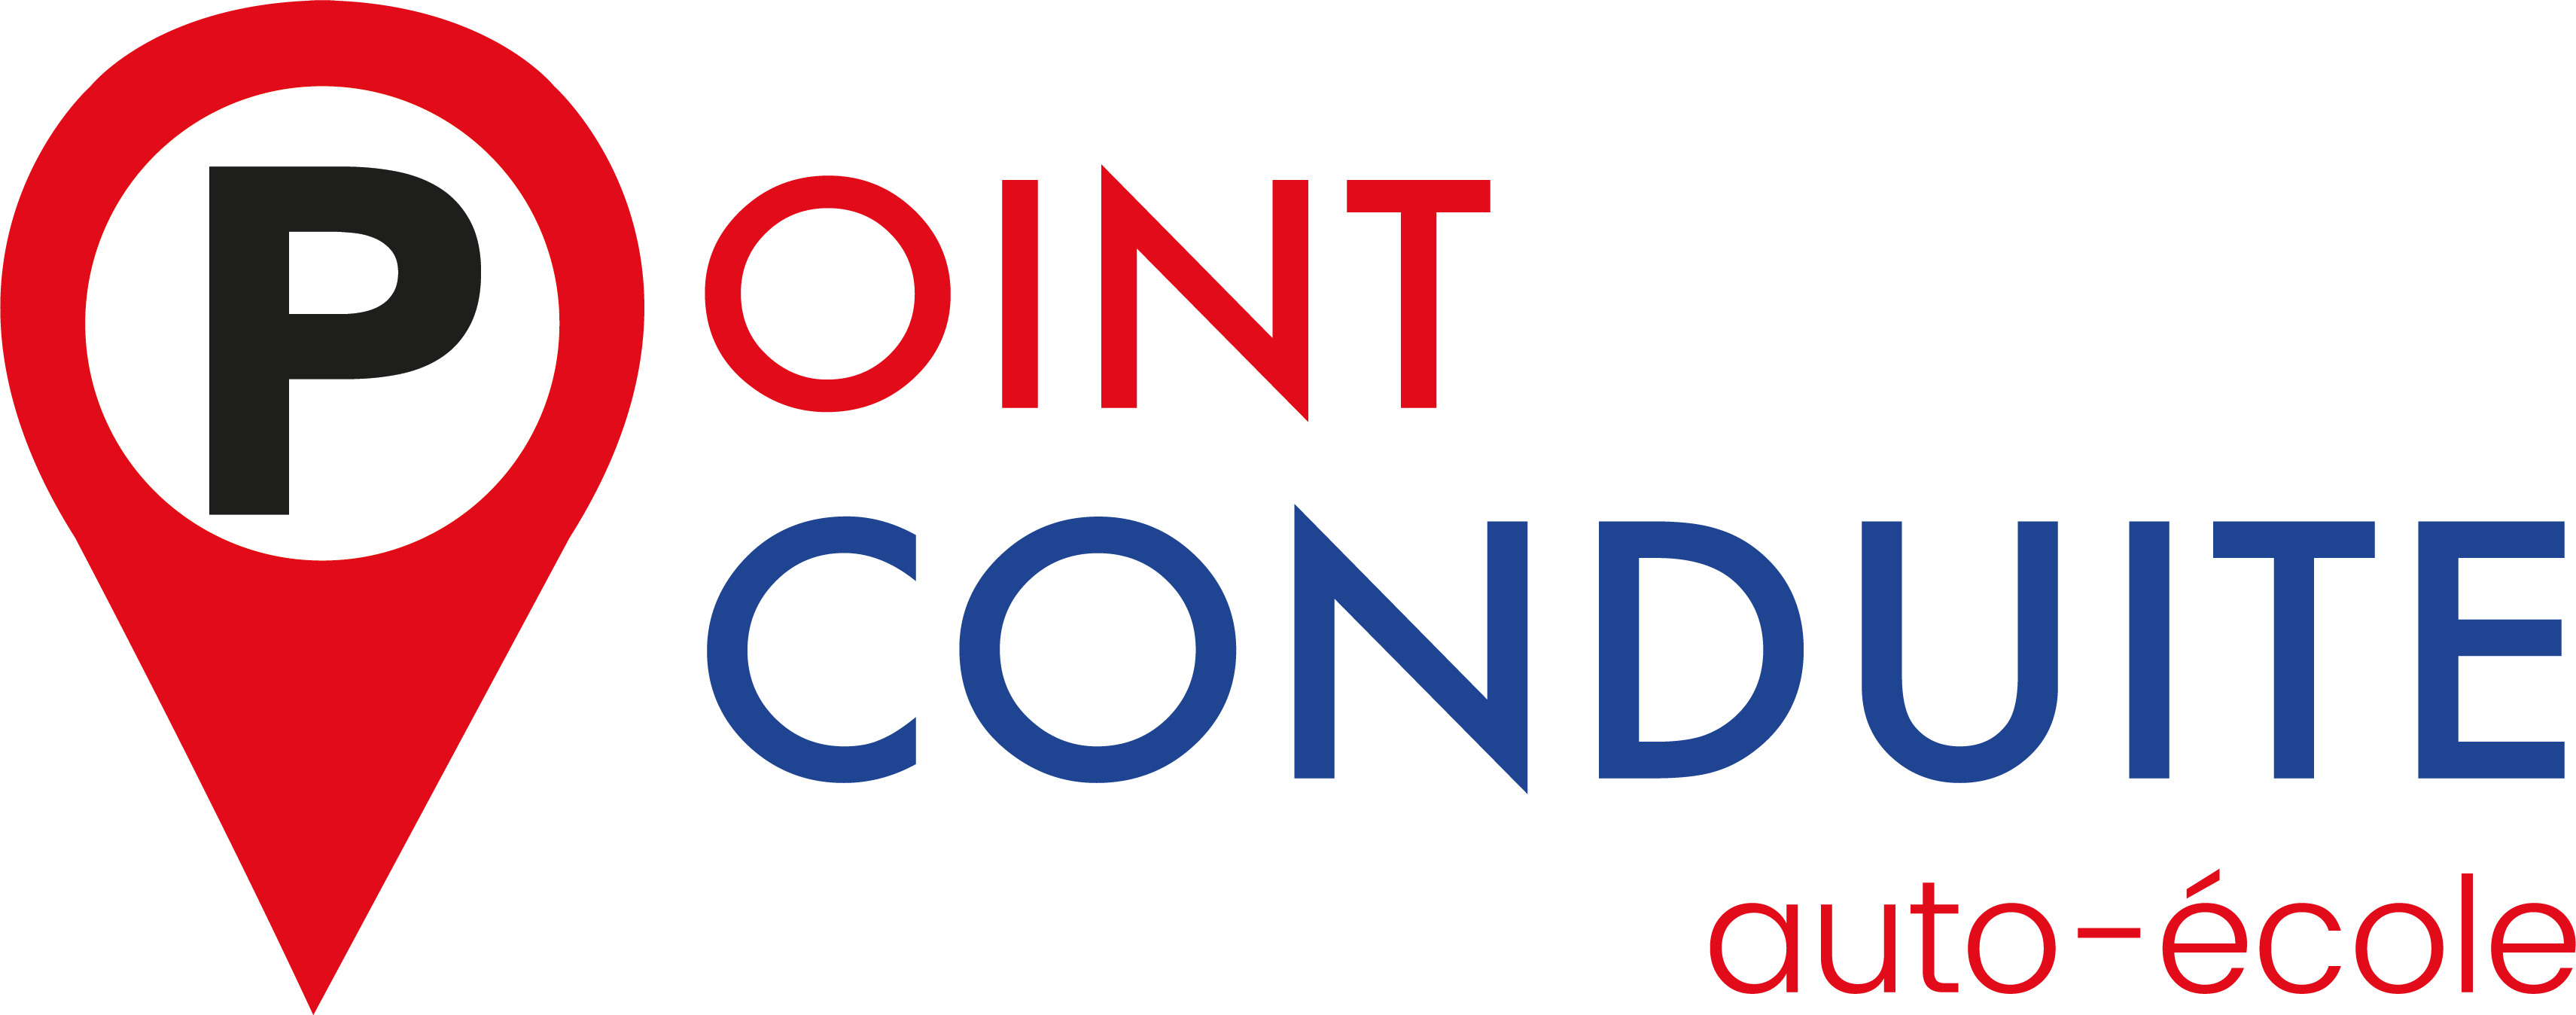 CER Point Conduite